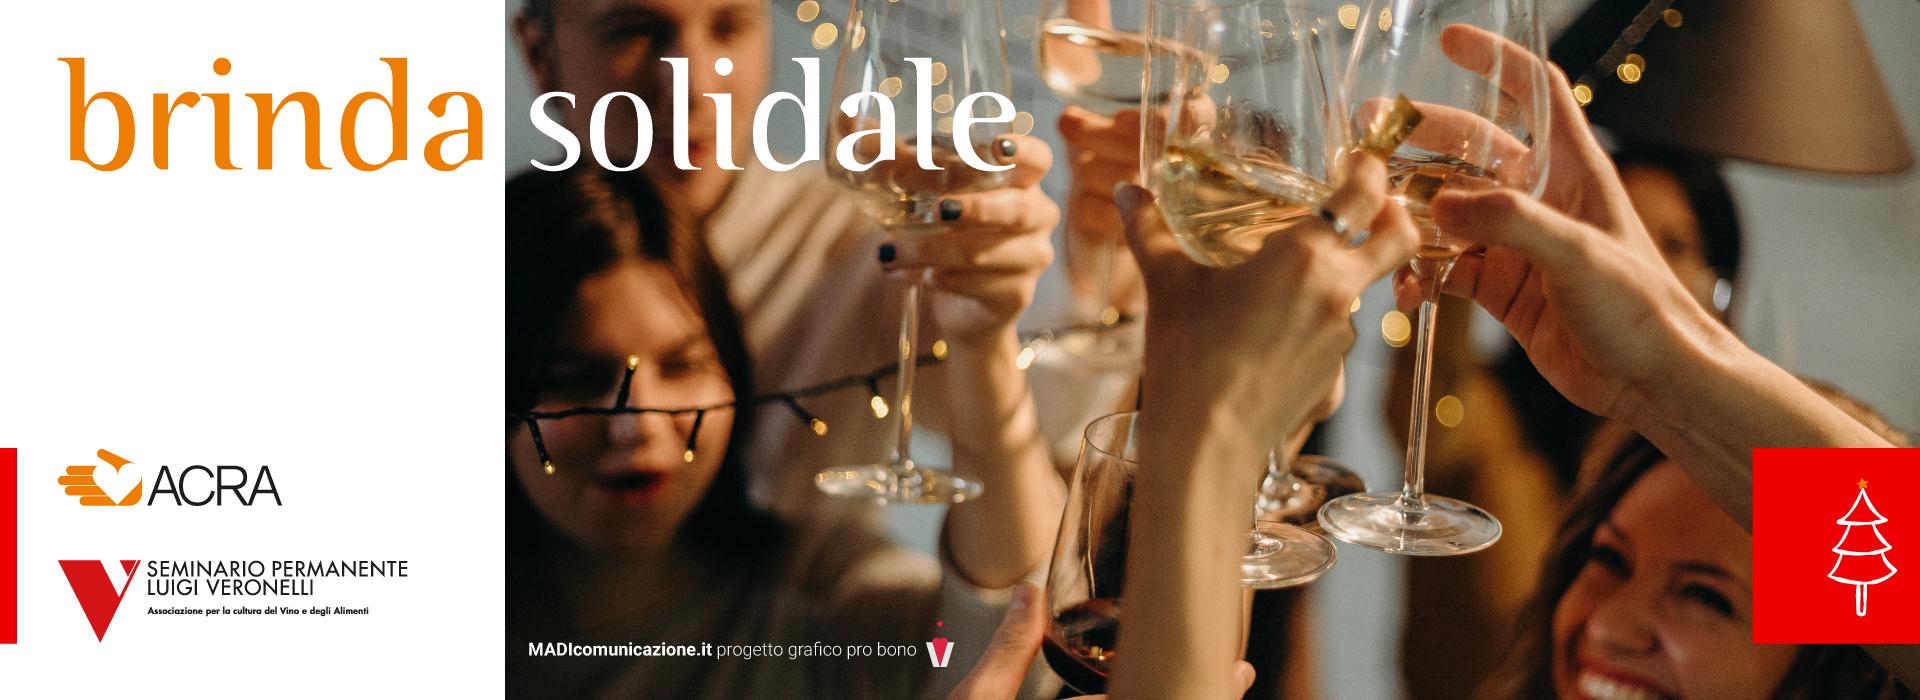 MADI-comunicazione-per-ACRA_brinda-solidale-Facebook-Natale